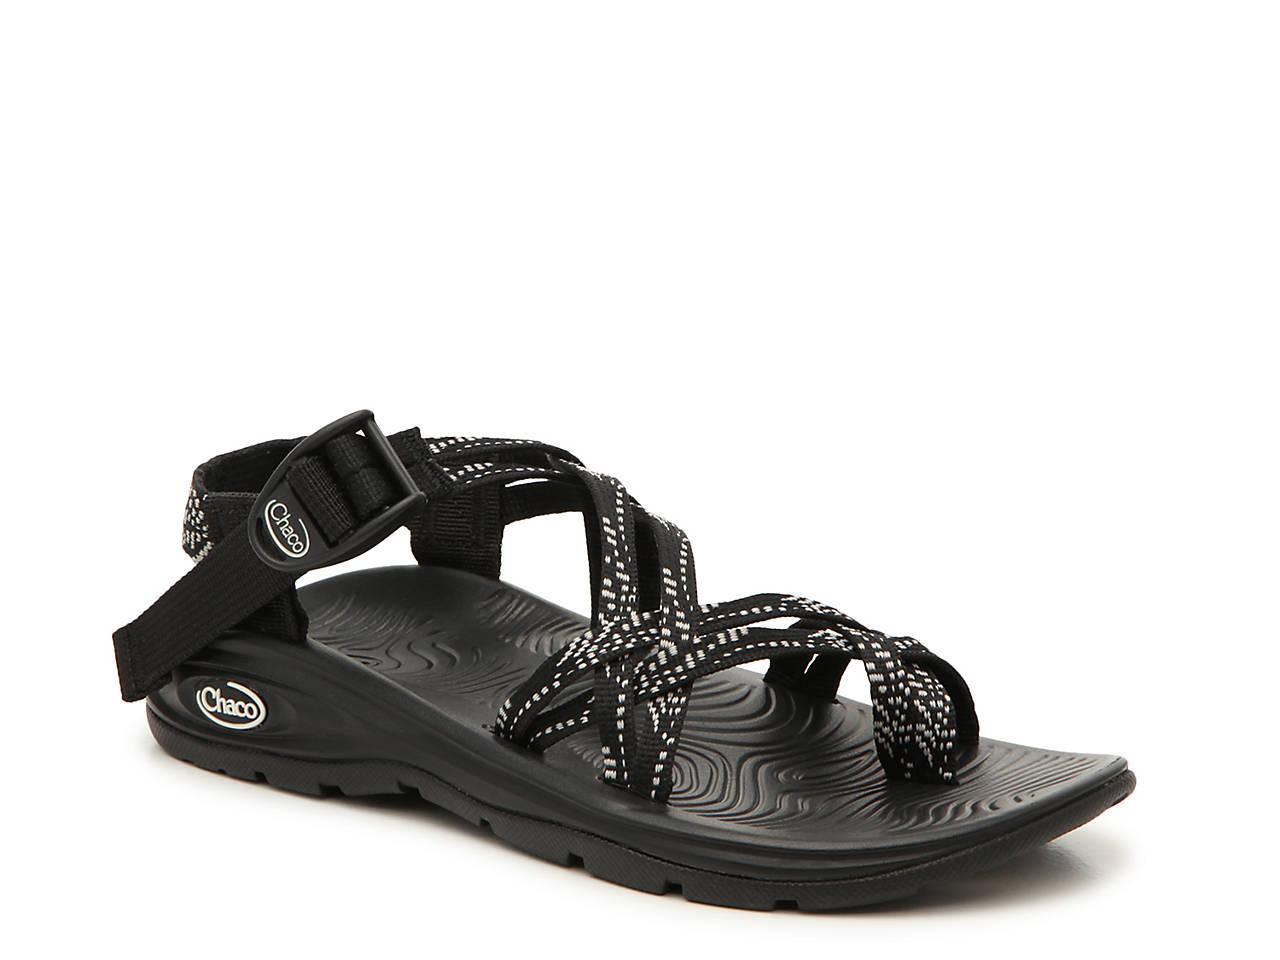 90fe2f12fc20 Chaco Z Volv X2 Sandal Women s Shoes